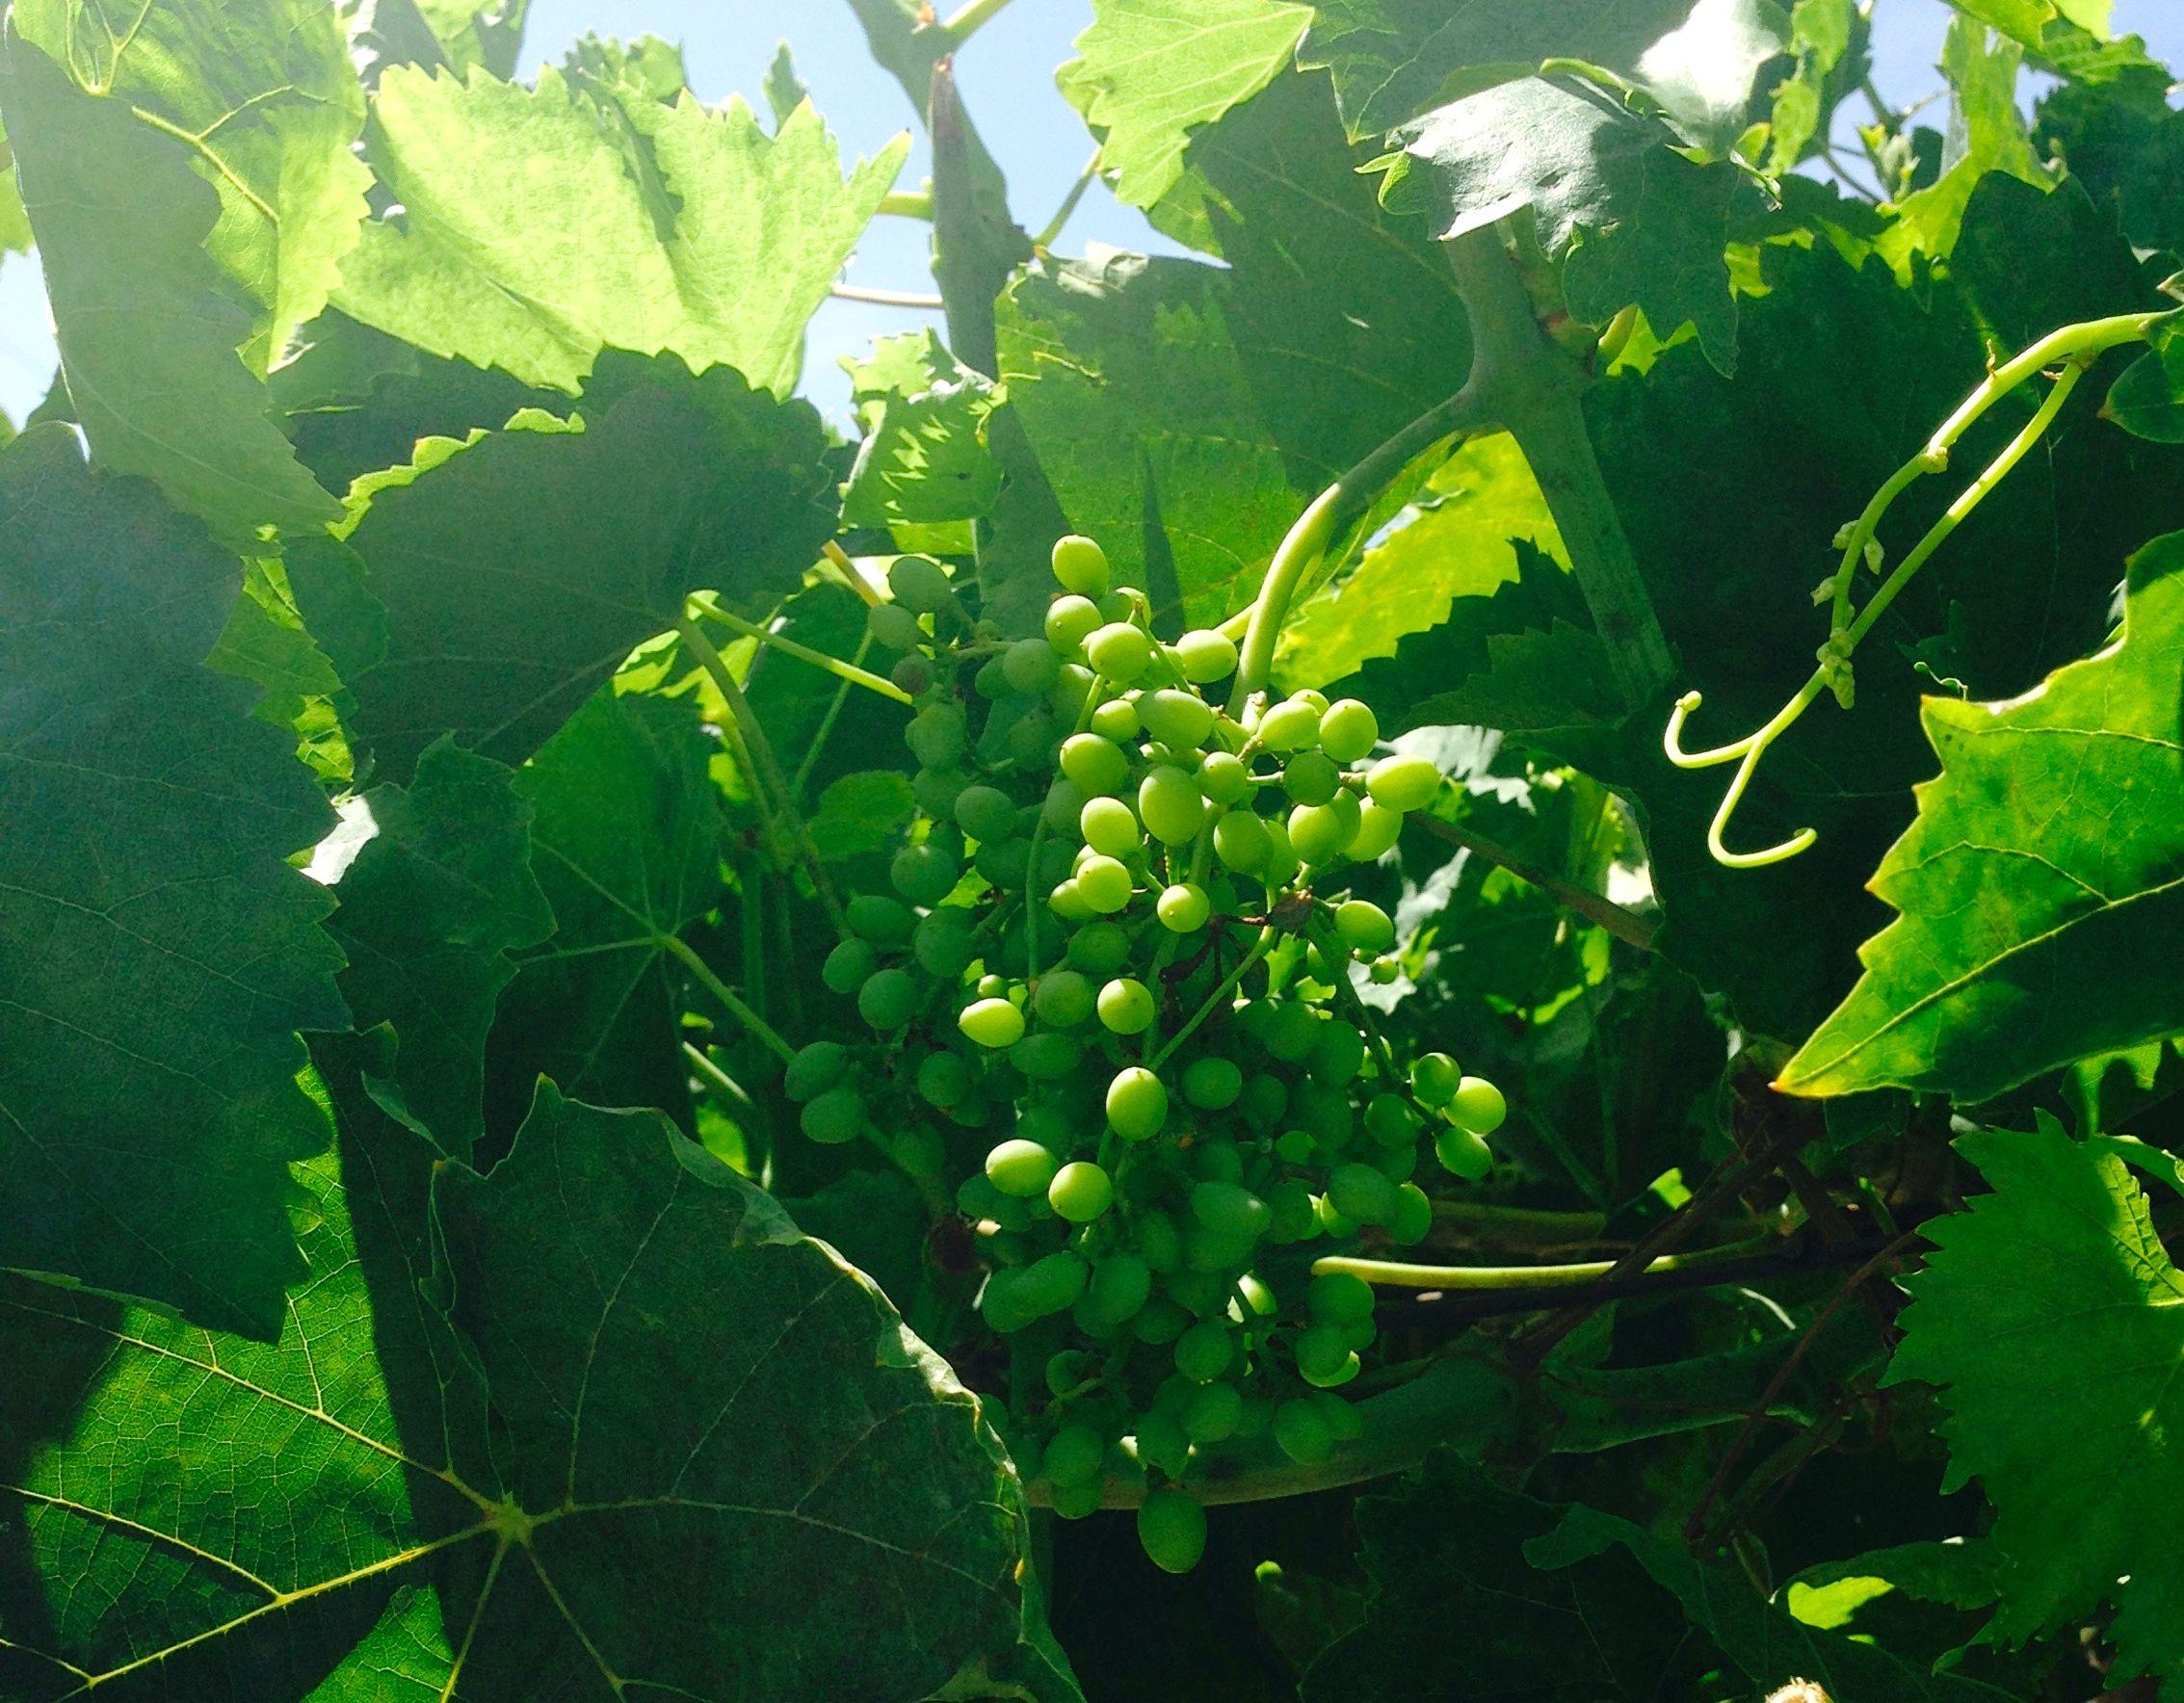 Grapes growing grapes growing fruit